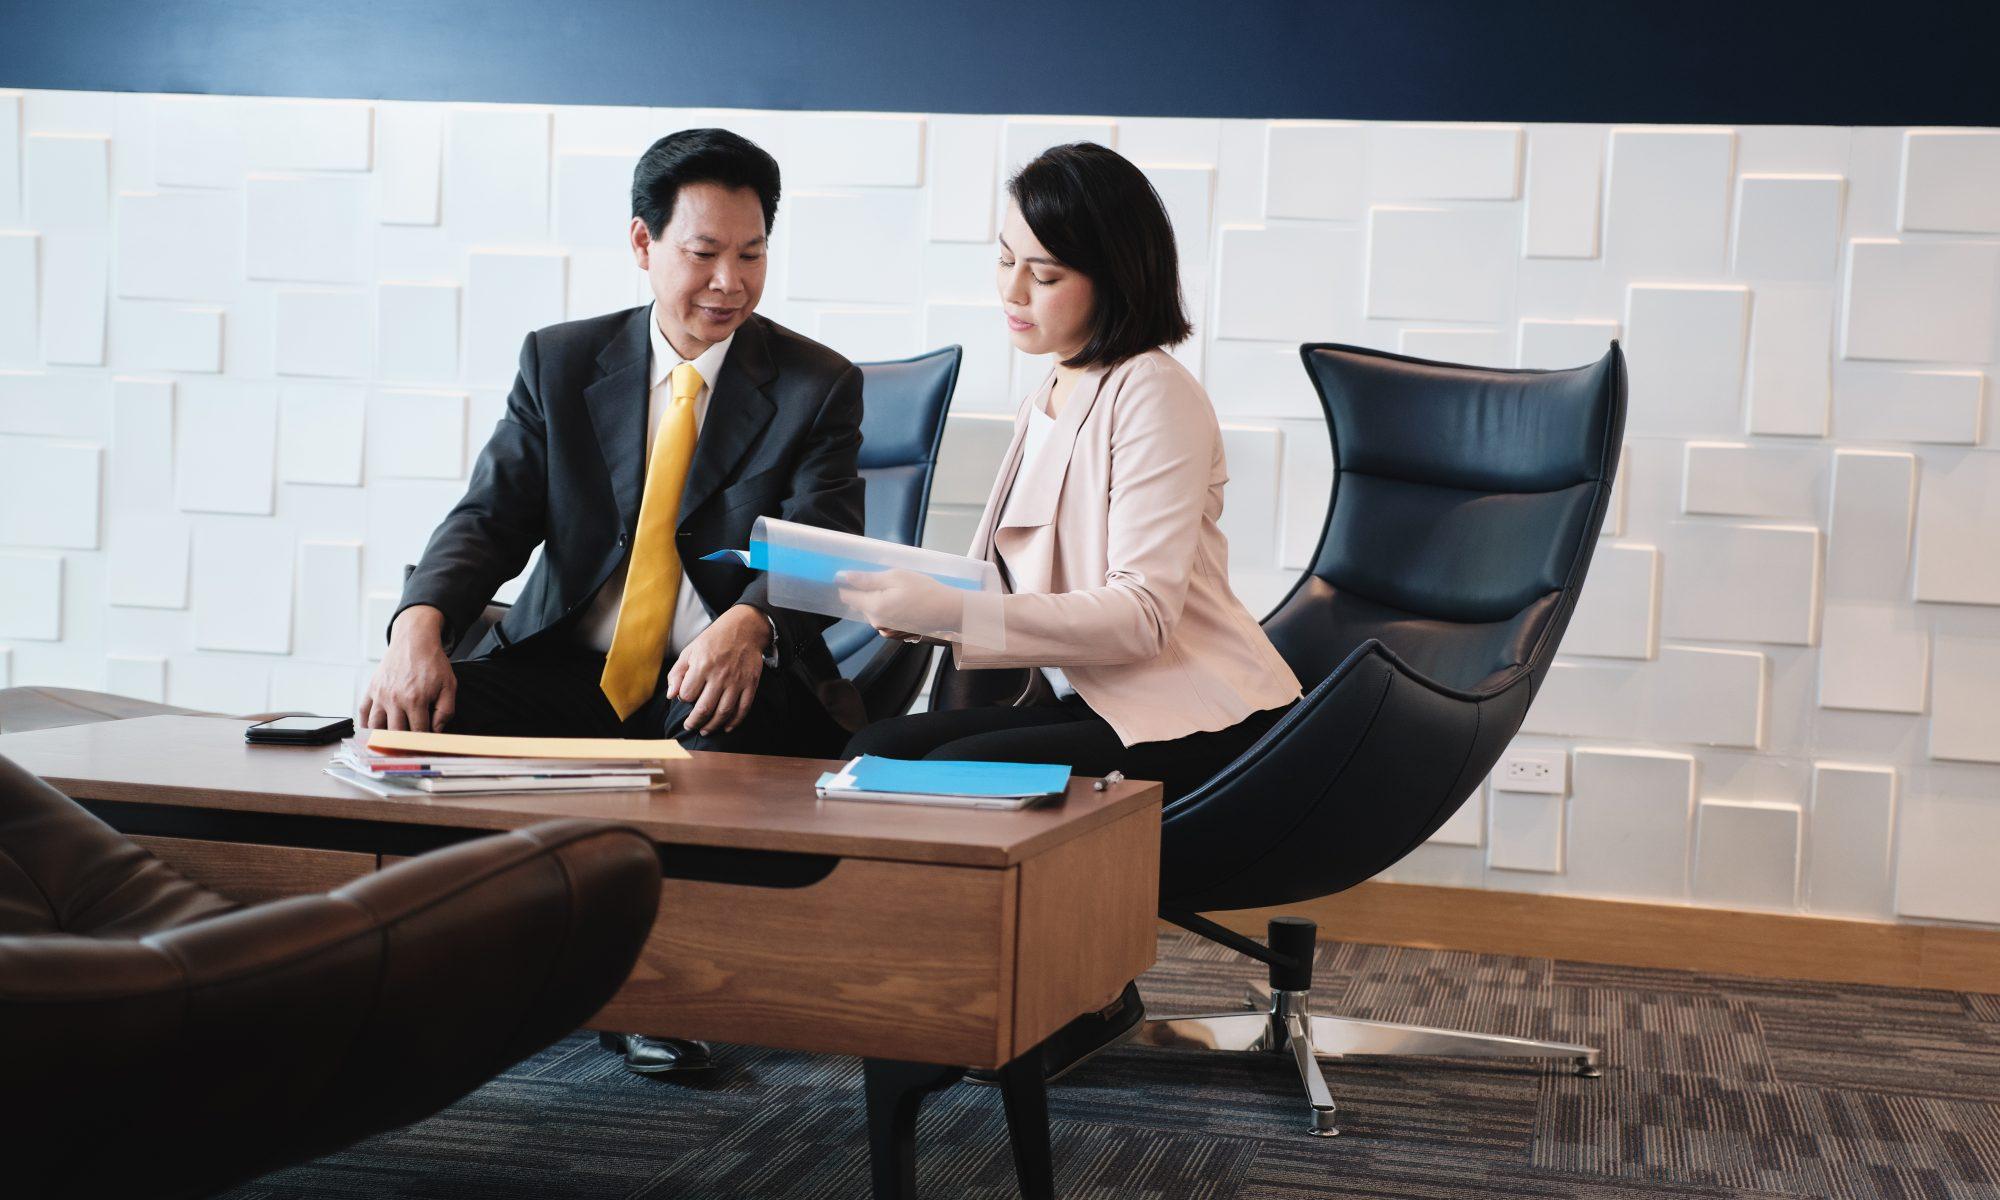 CMI qualification in professional consulting